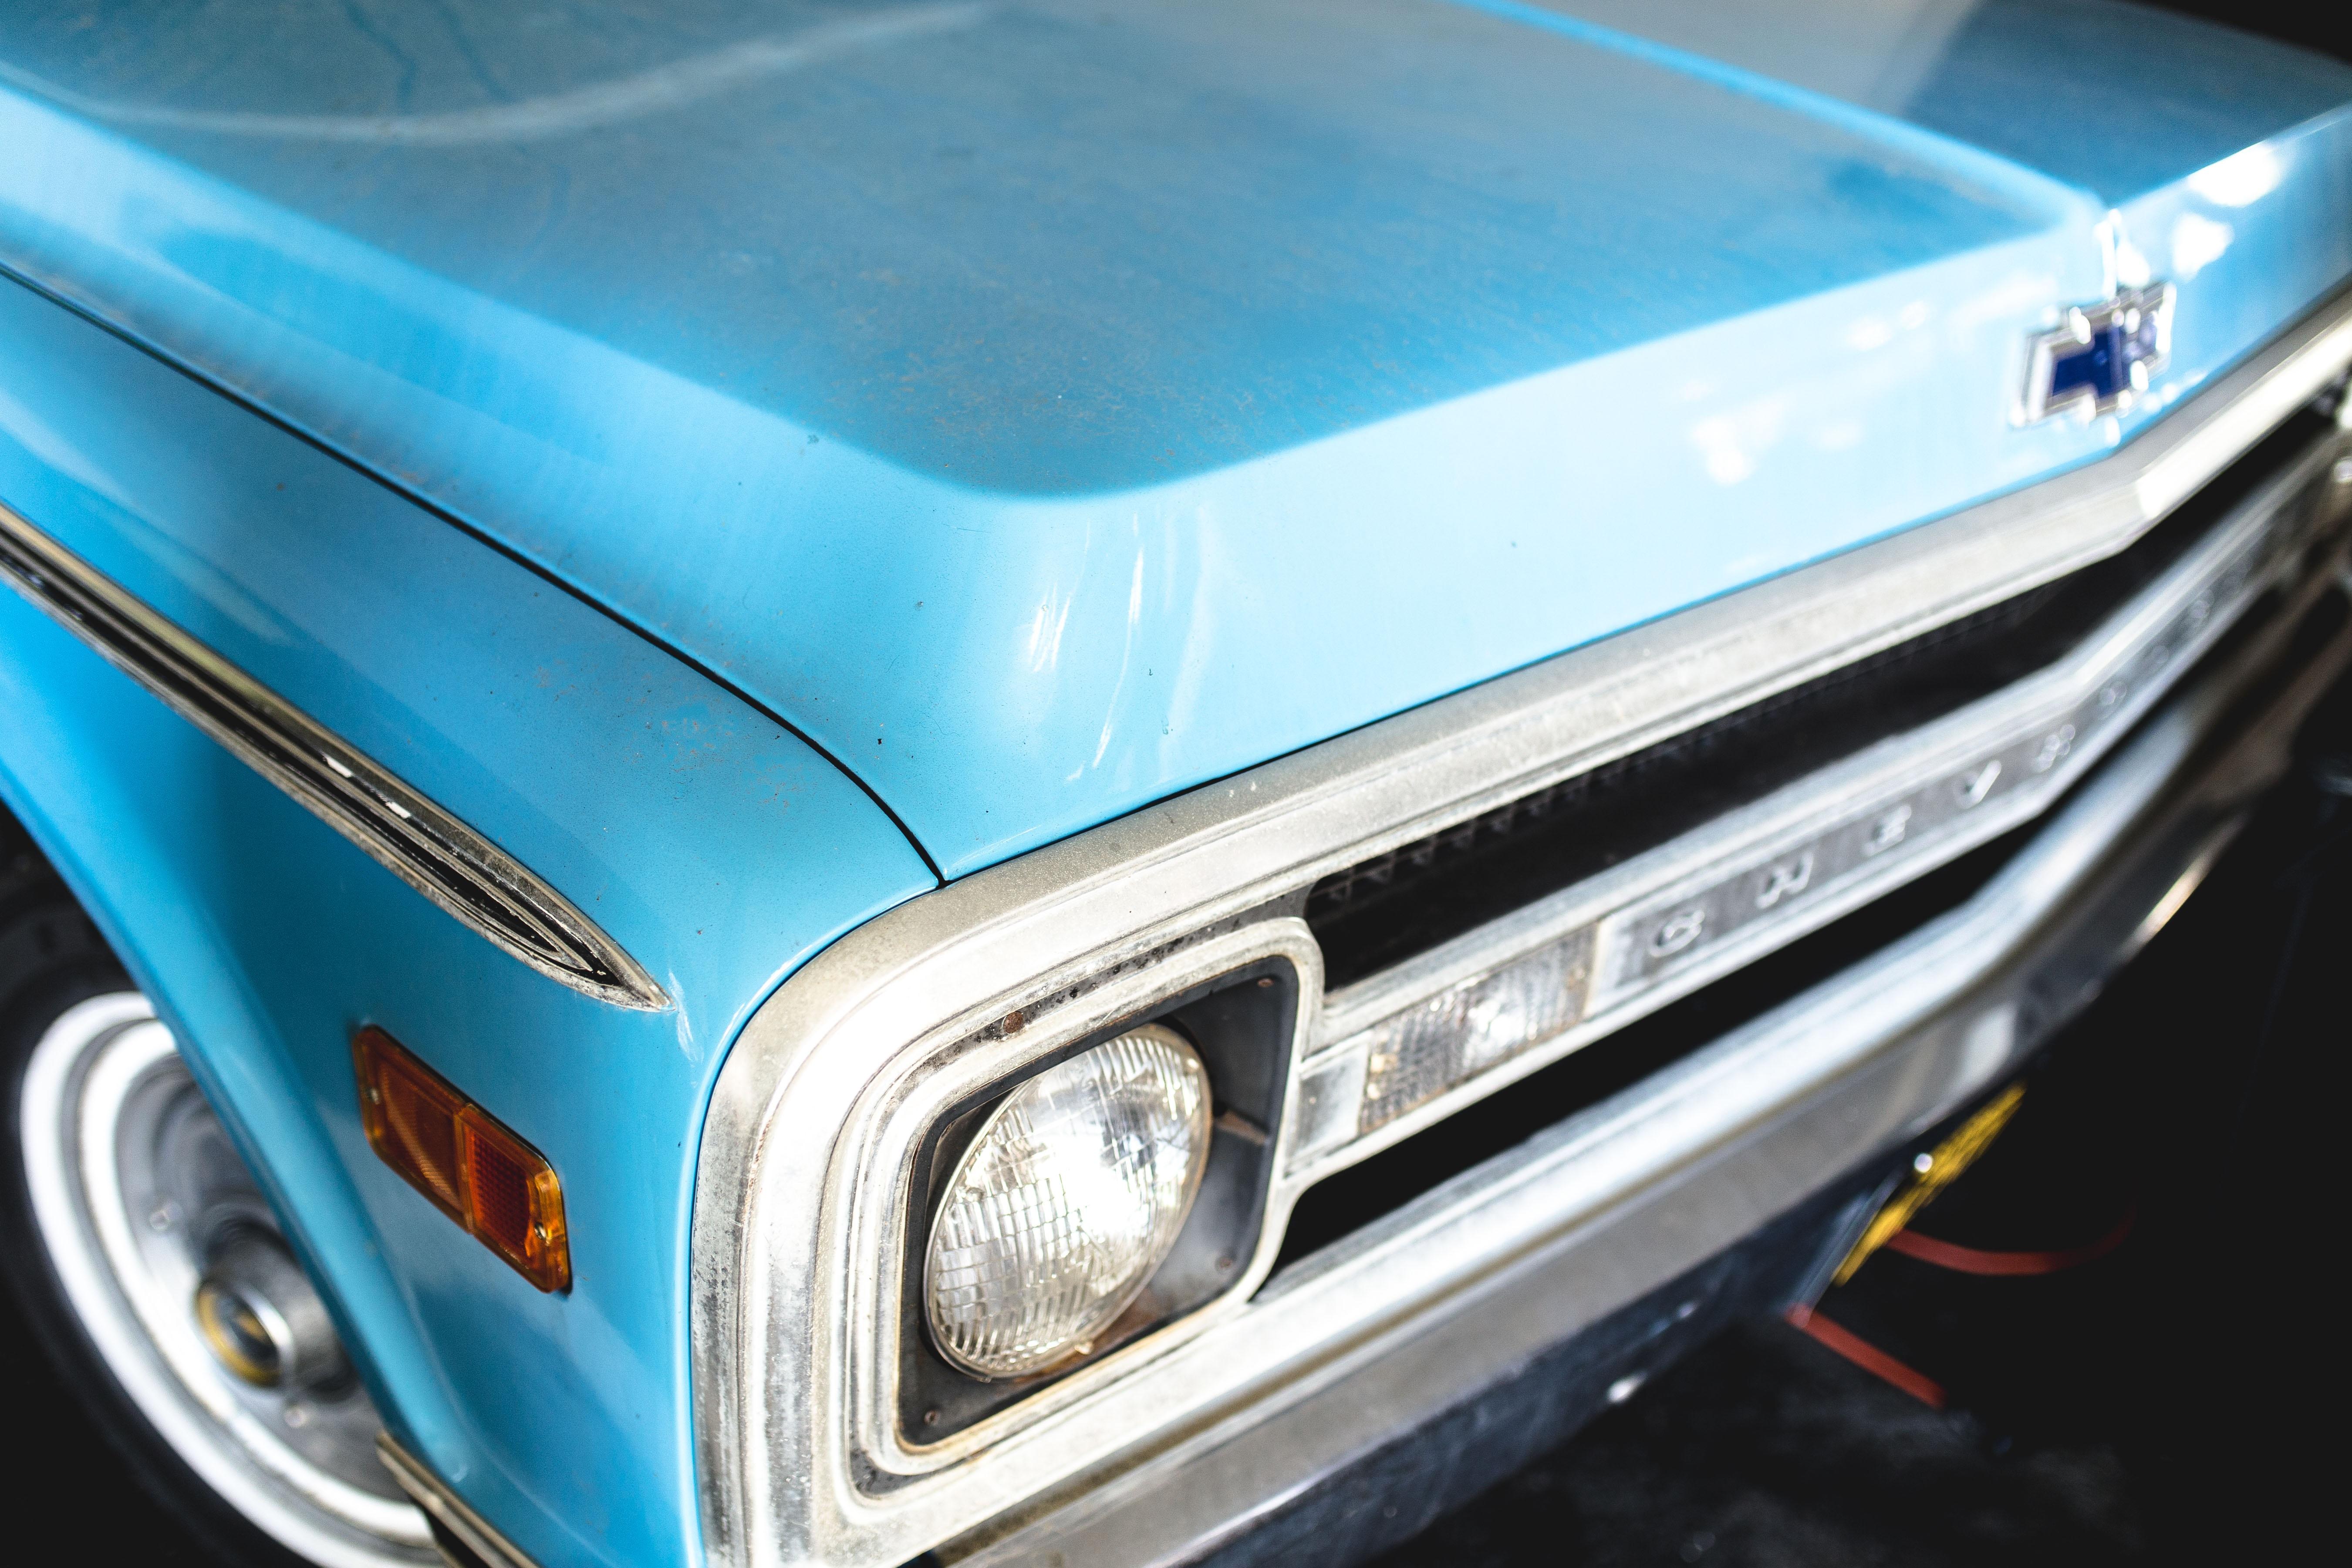 Old vintage sky blue Chevrolet front at Laguna Beach